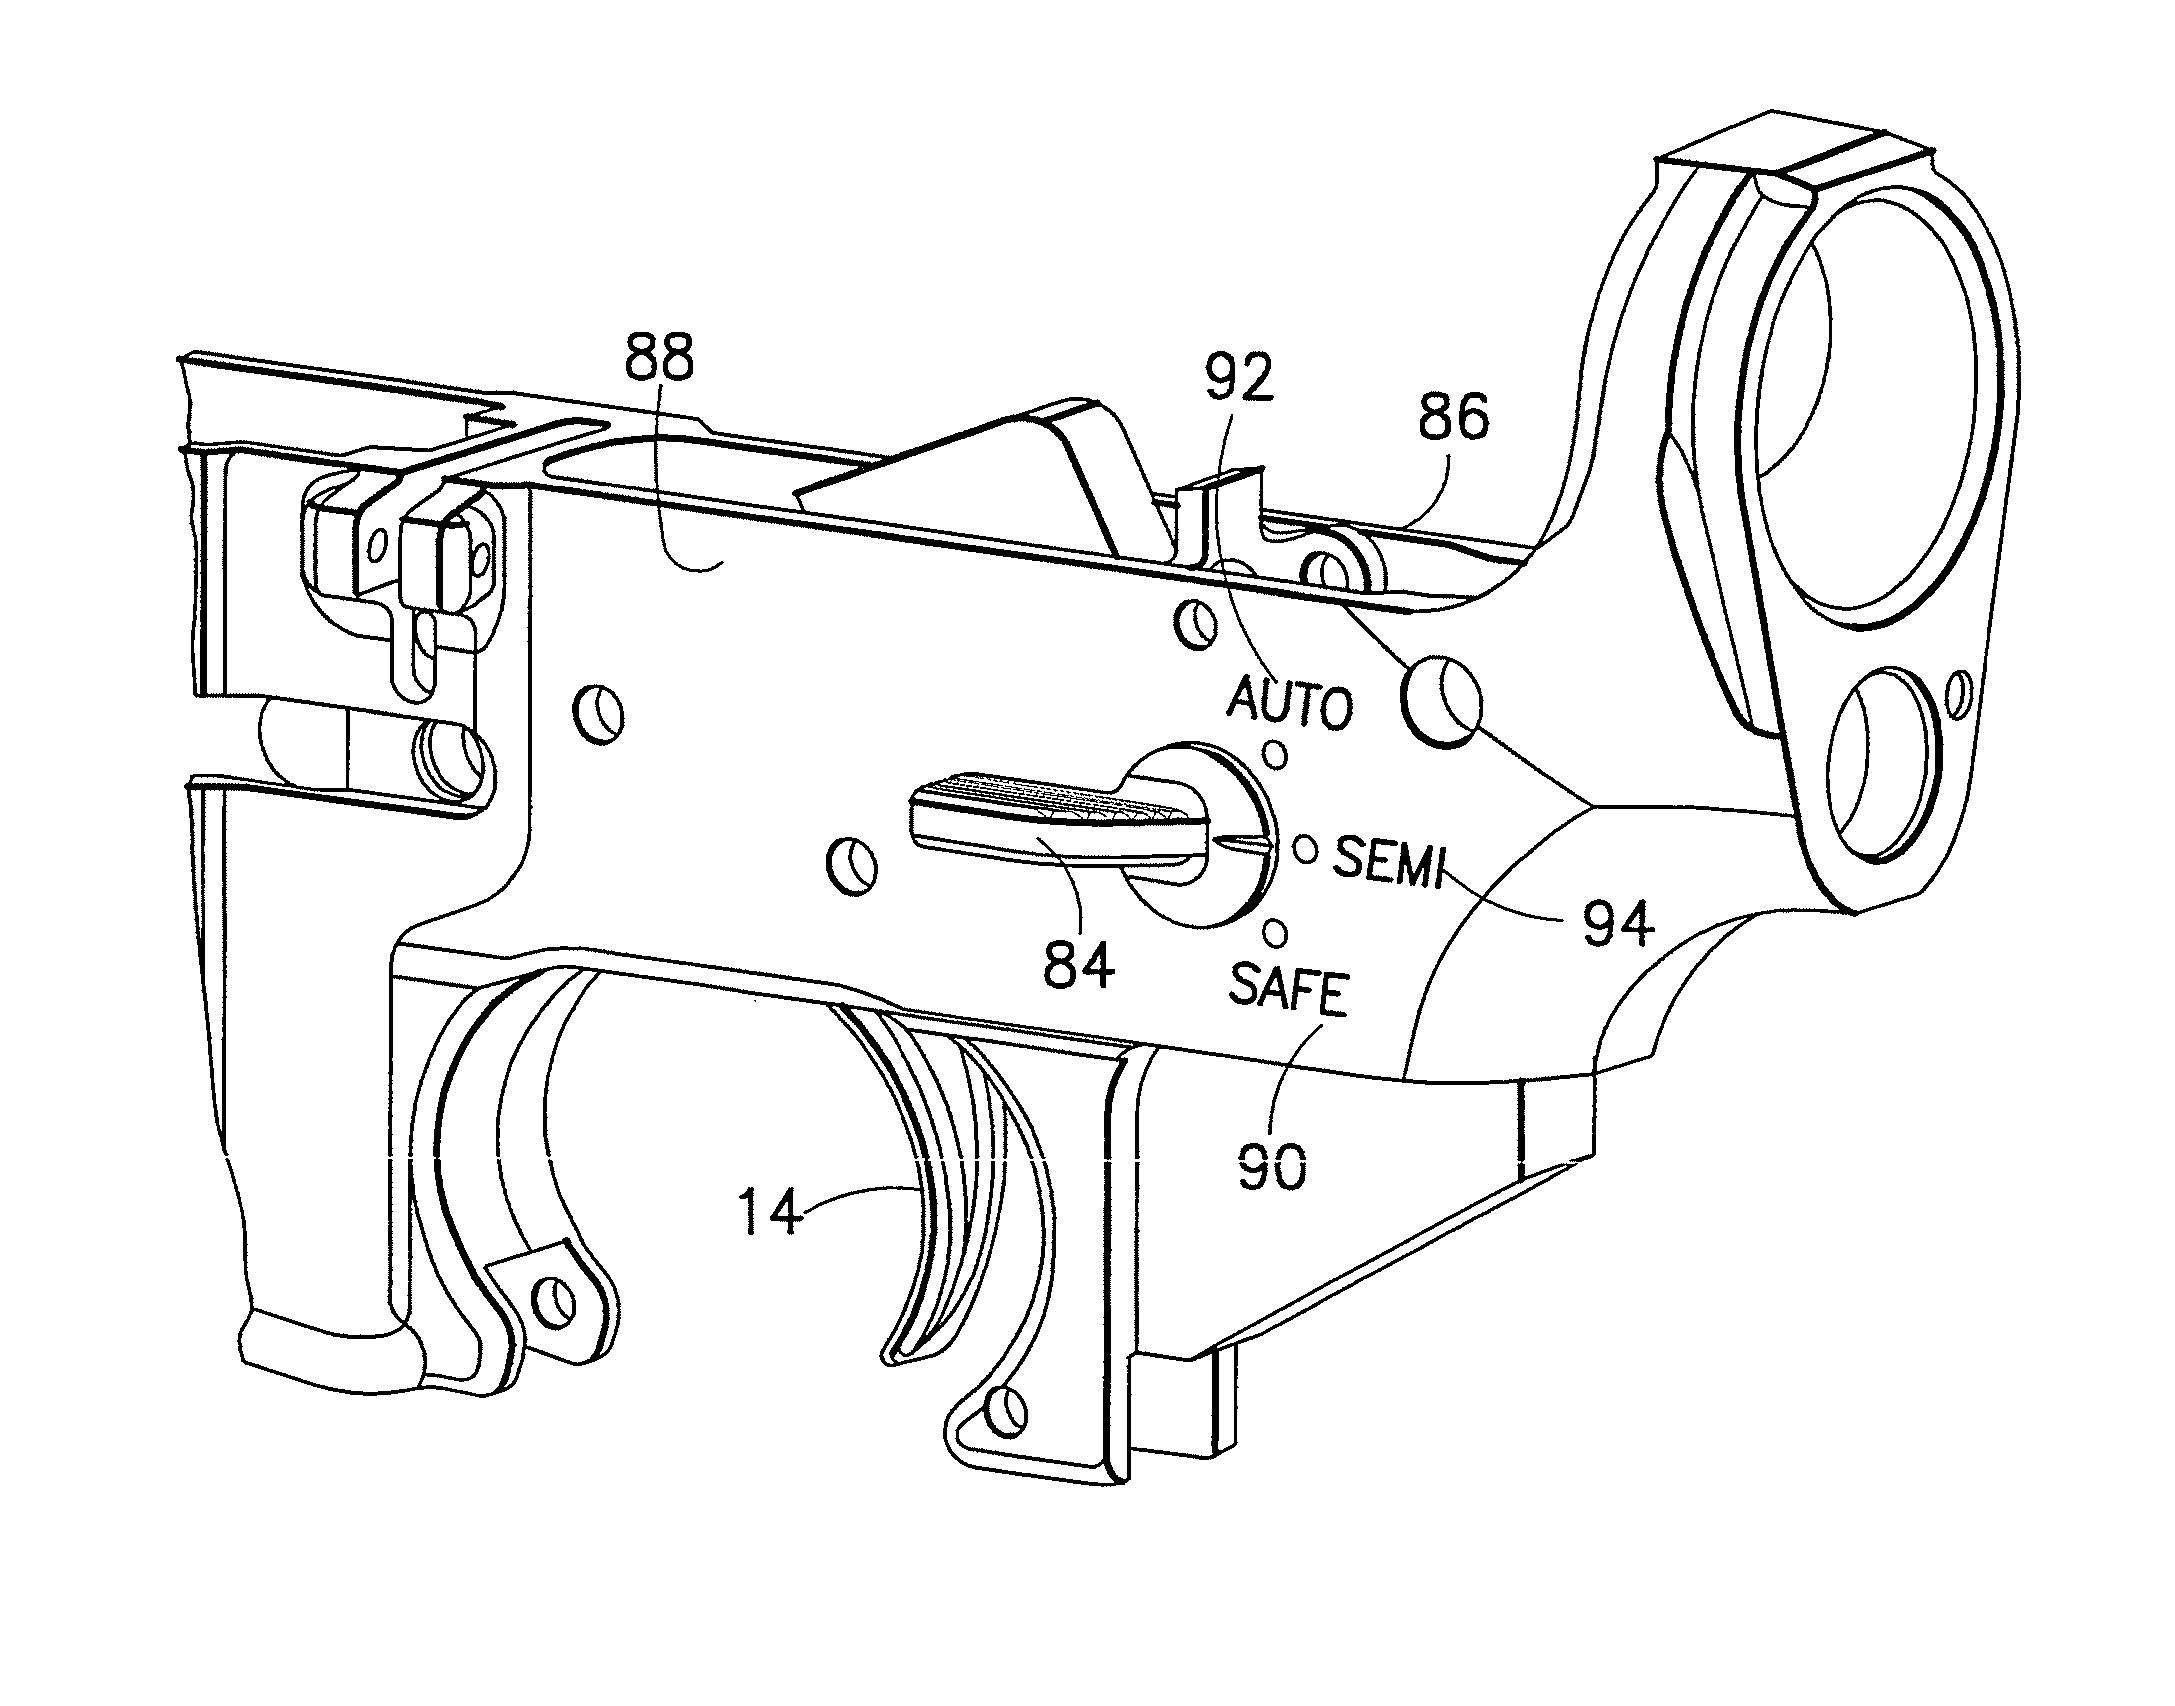 m16 auto sear drawing